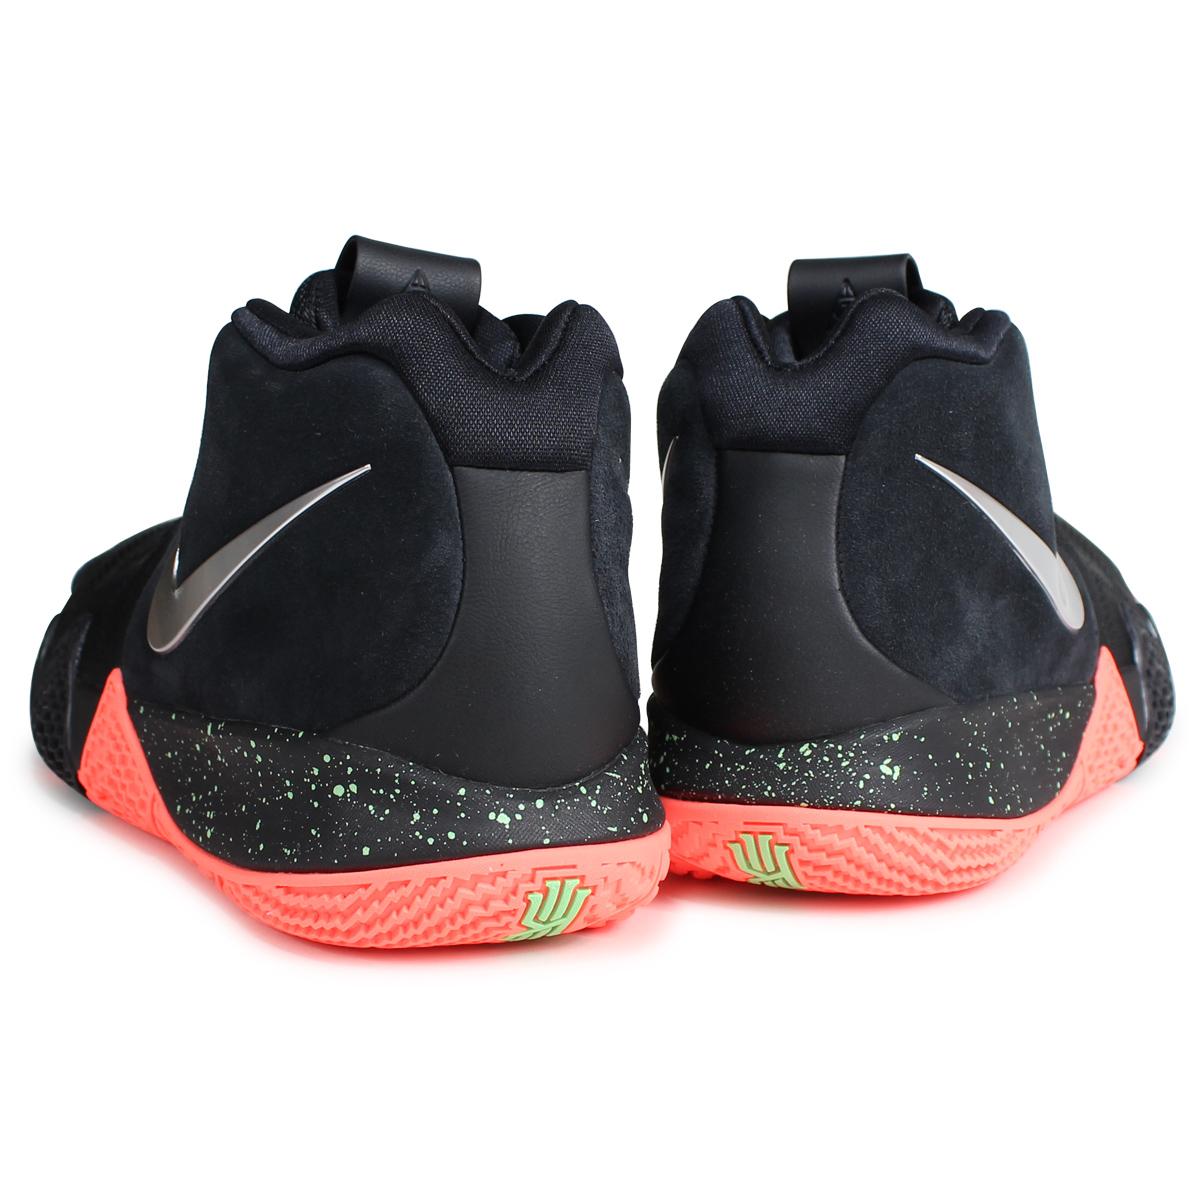 on sale 6e36f 5df3f NIKE EP KYRIE 4 EP Nike Carly 4 943,807-010 black